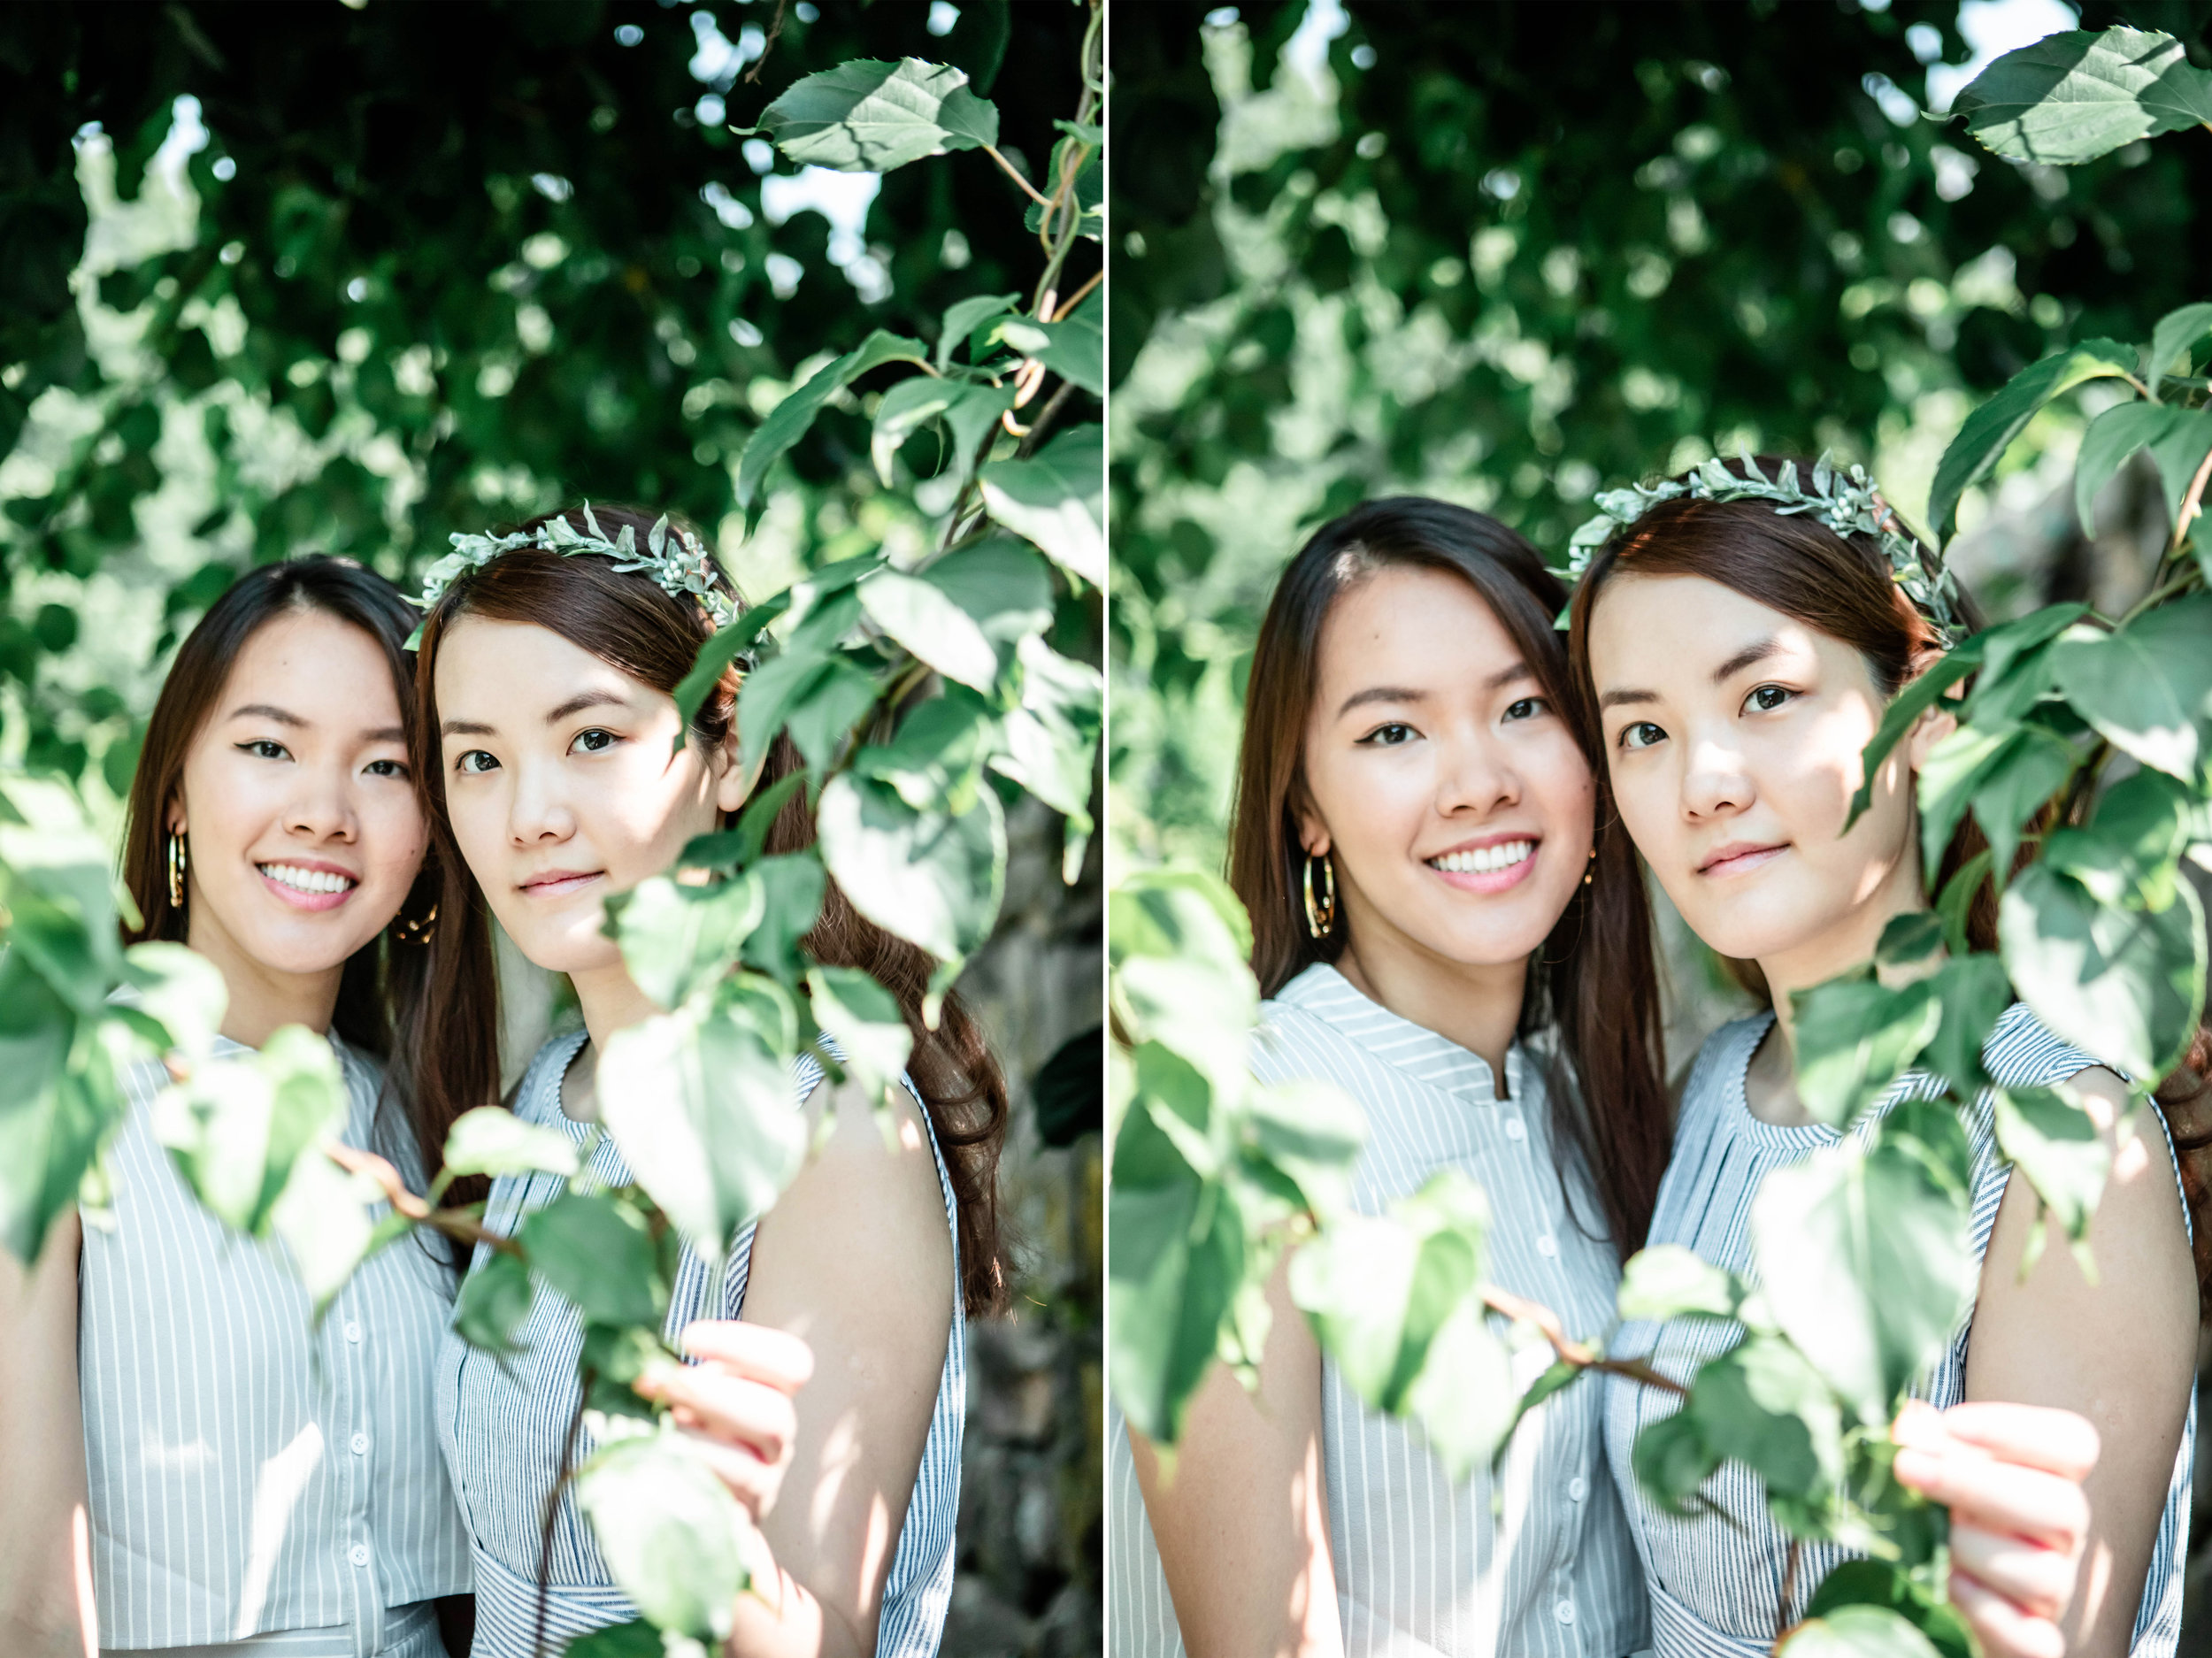 sisters-in-summertime-eva-loh-13.jpg